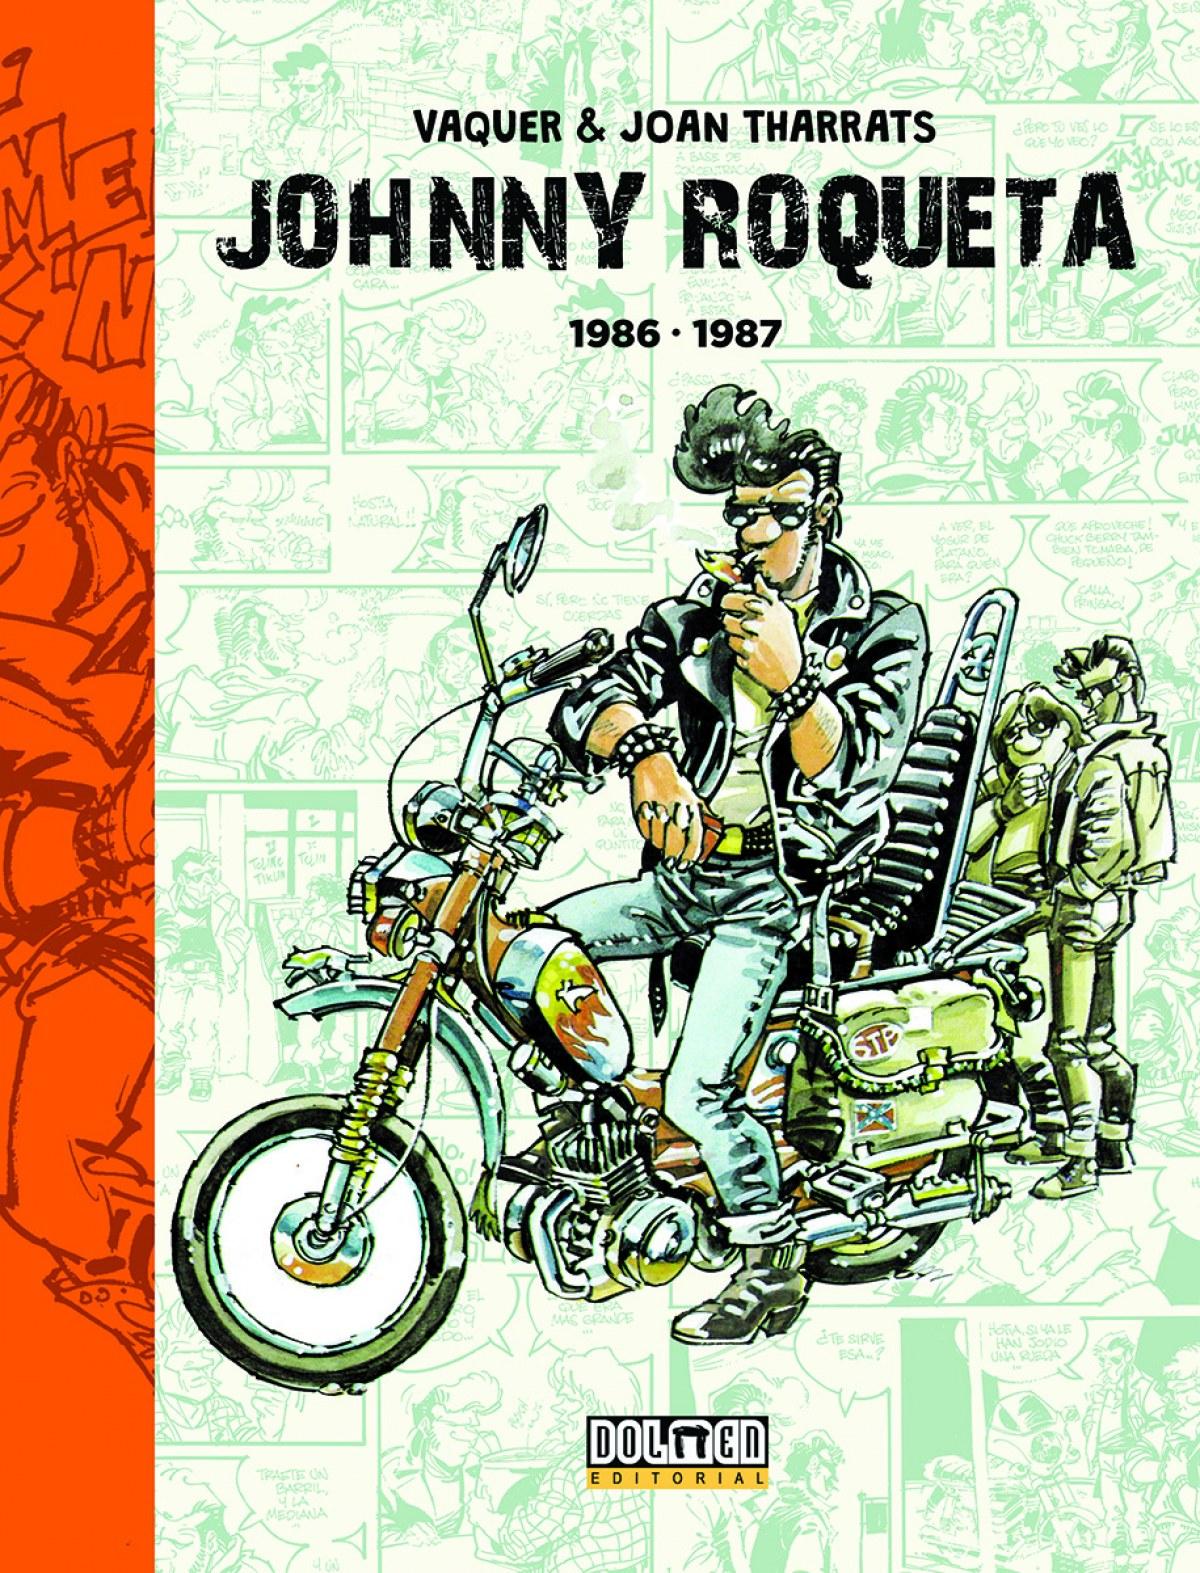 JOHNNY ROQUETA 1986-1987